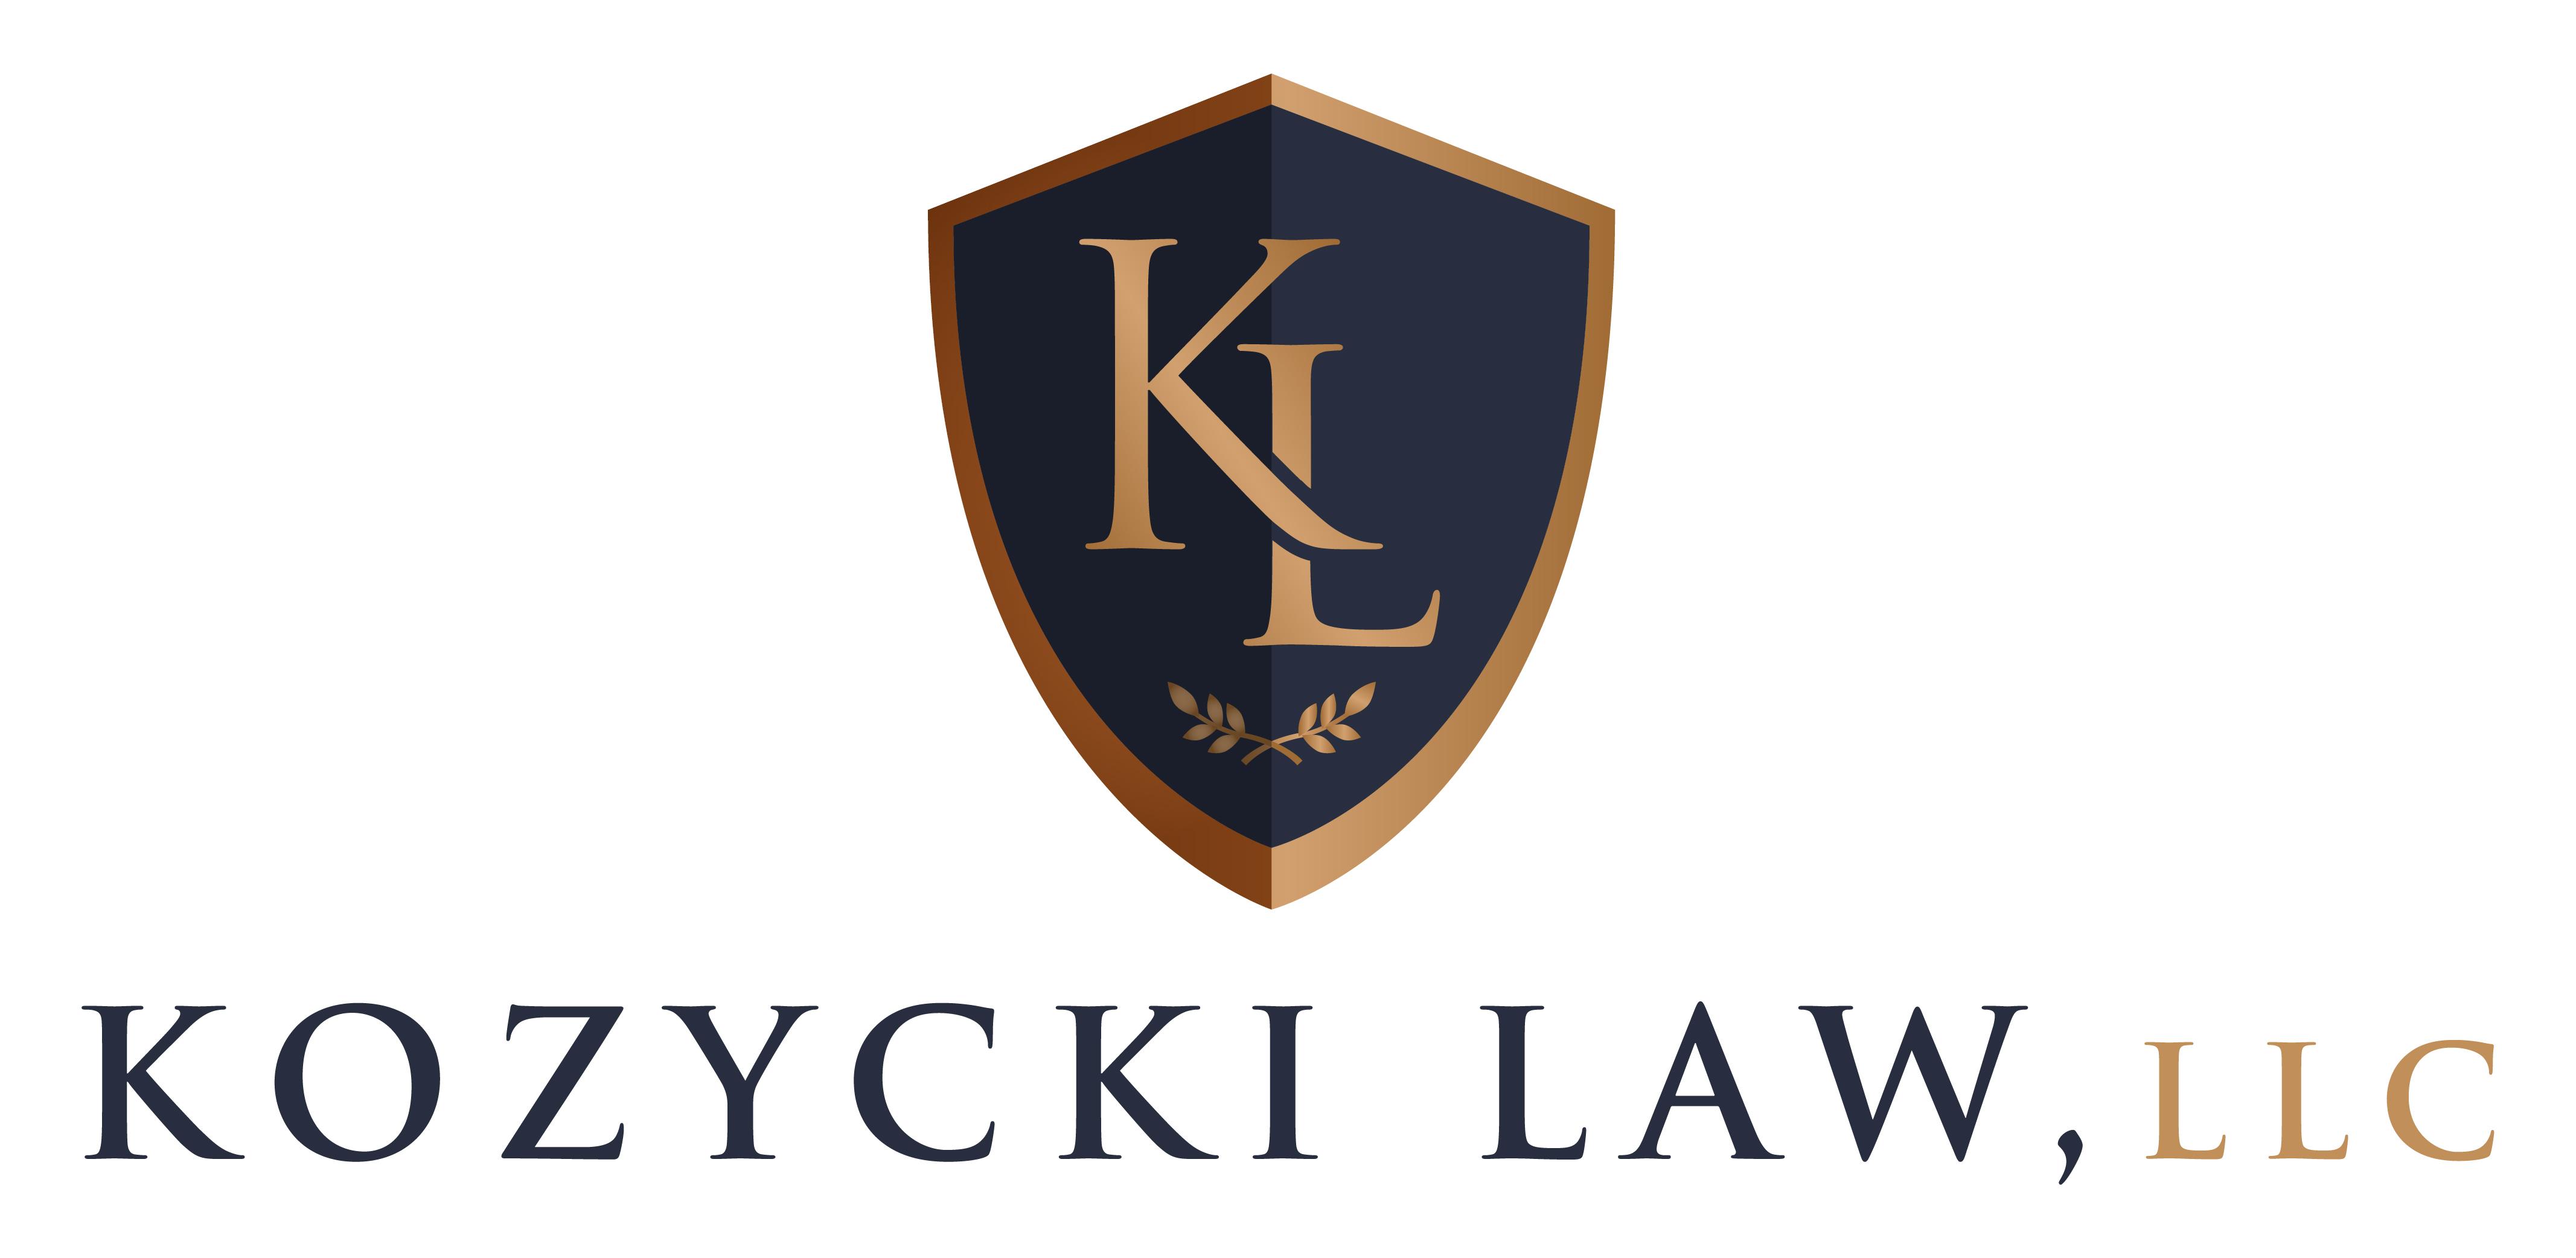 Kozycki Law